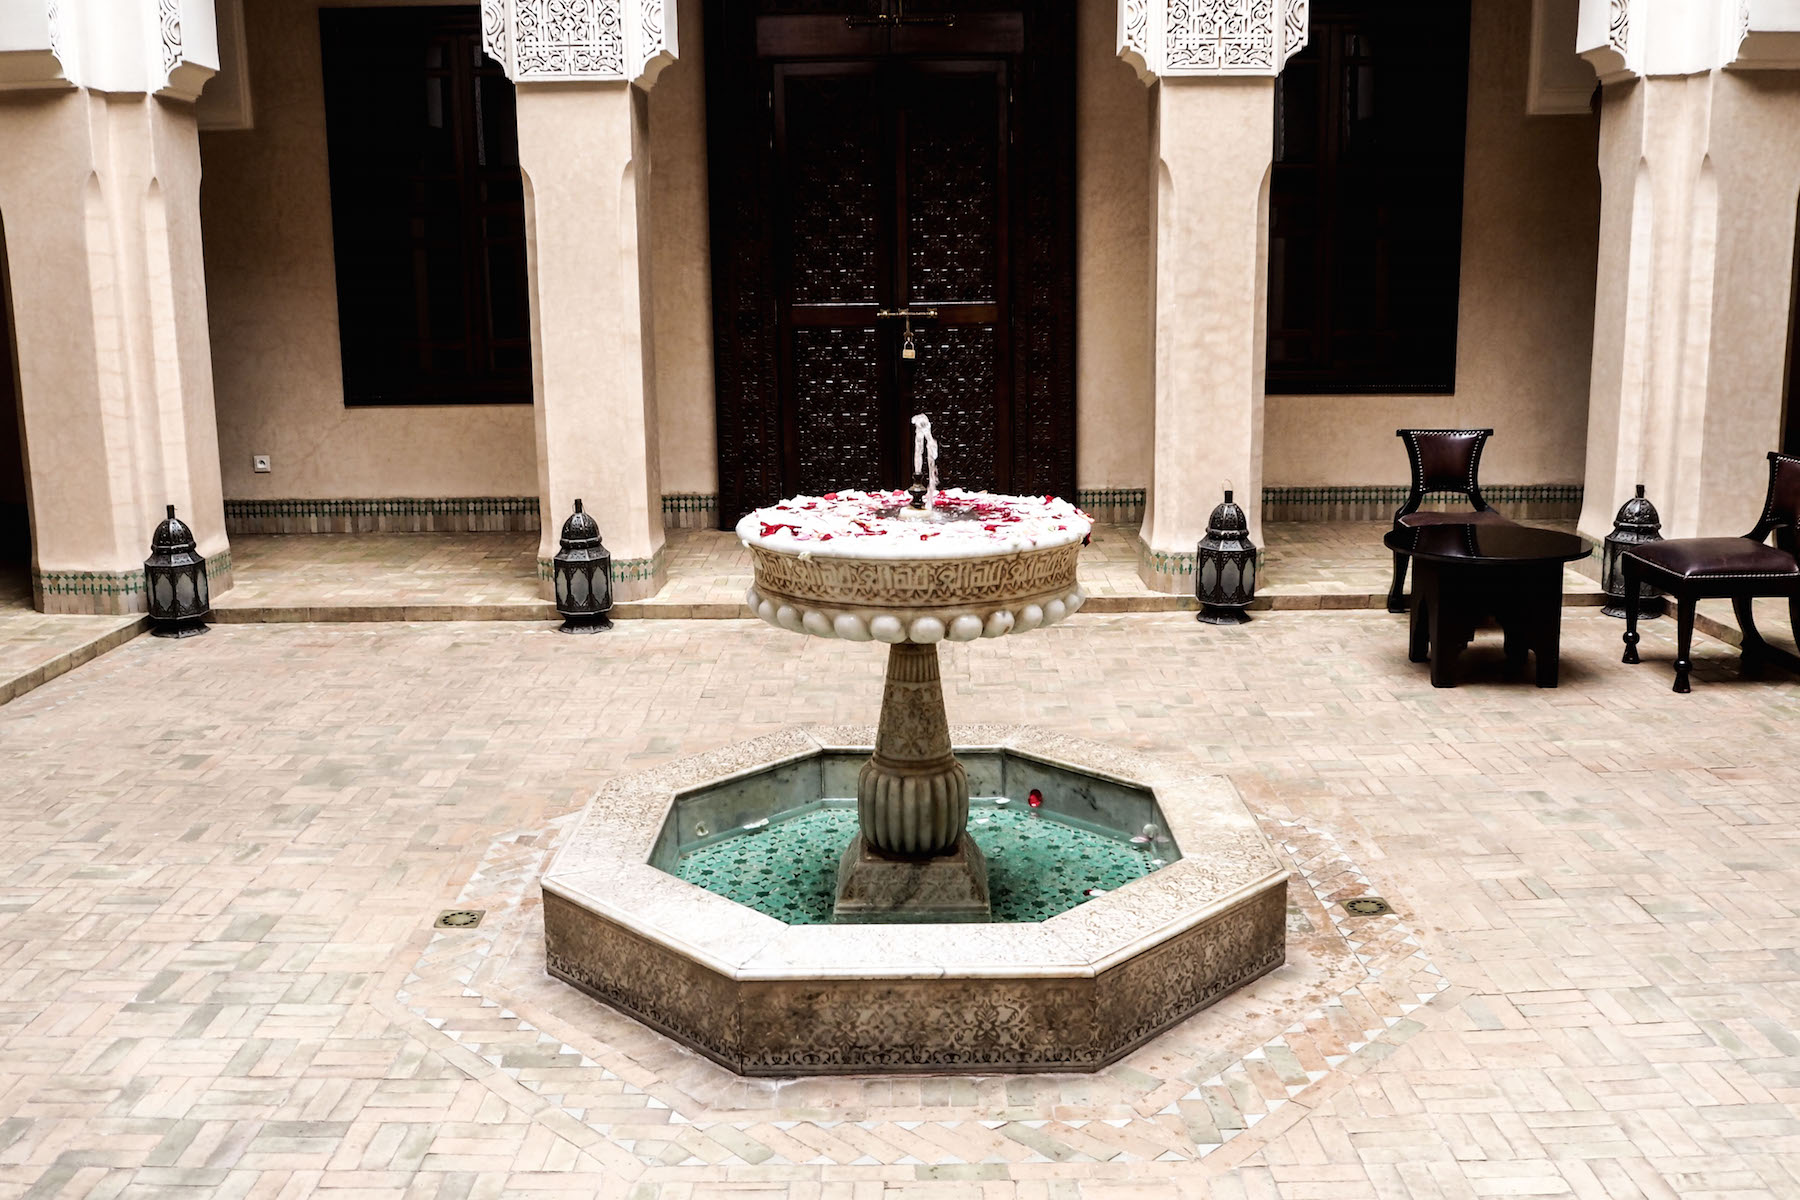 Fountains at Riad Kniza, Marrakech